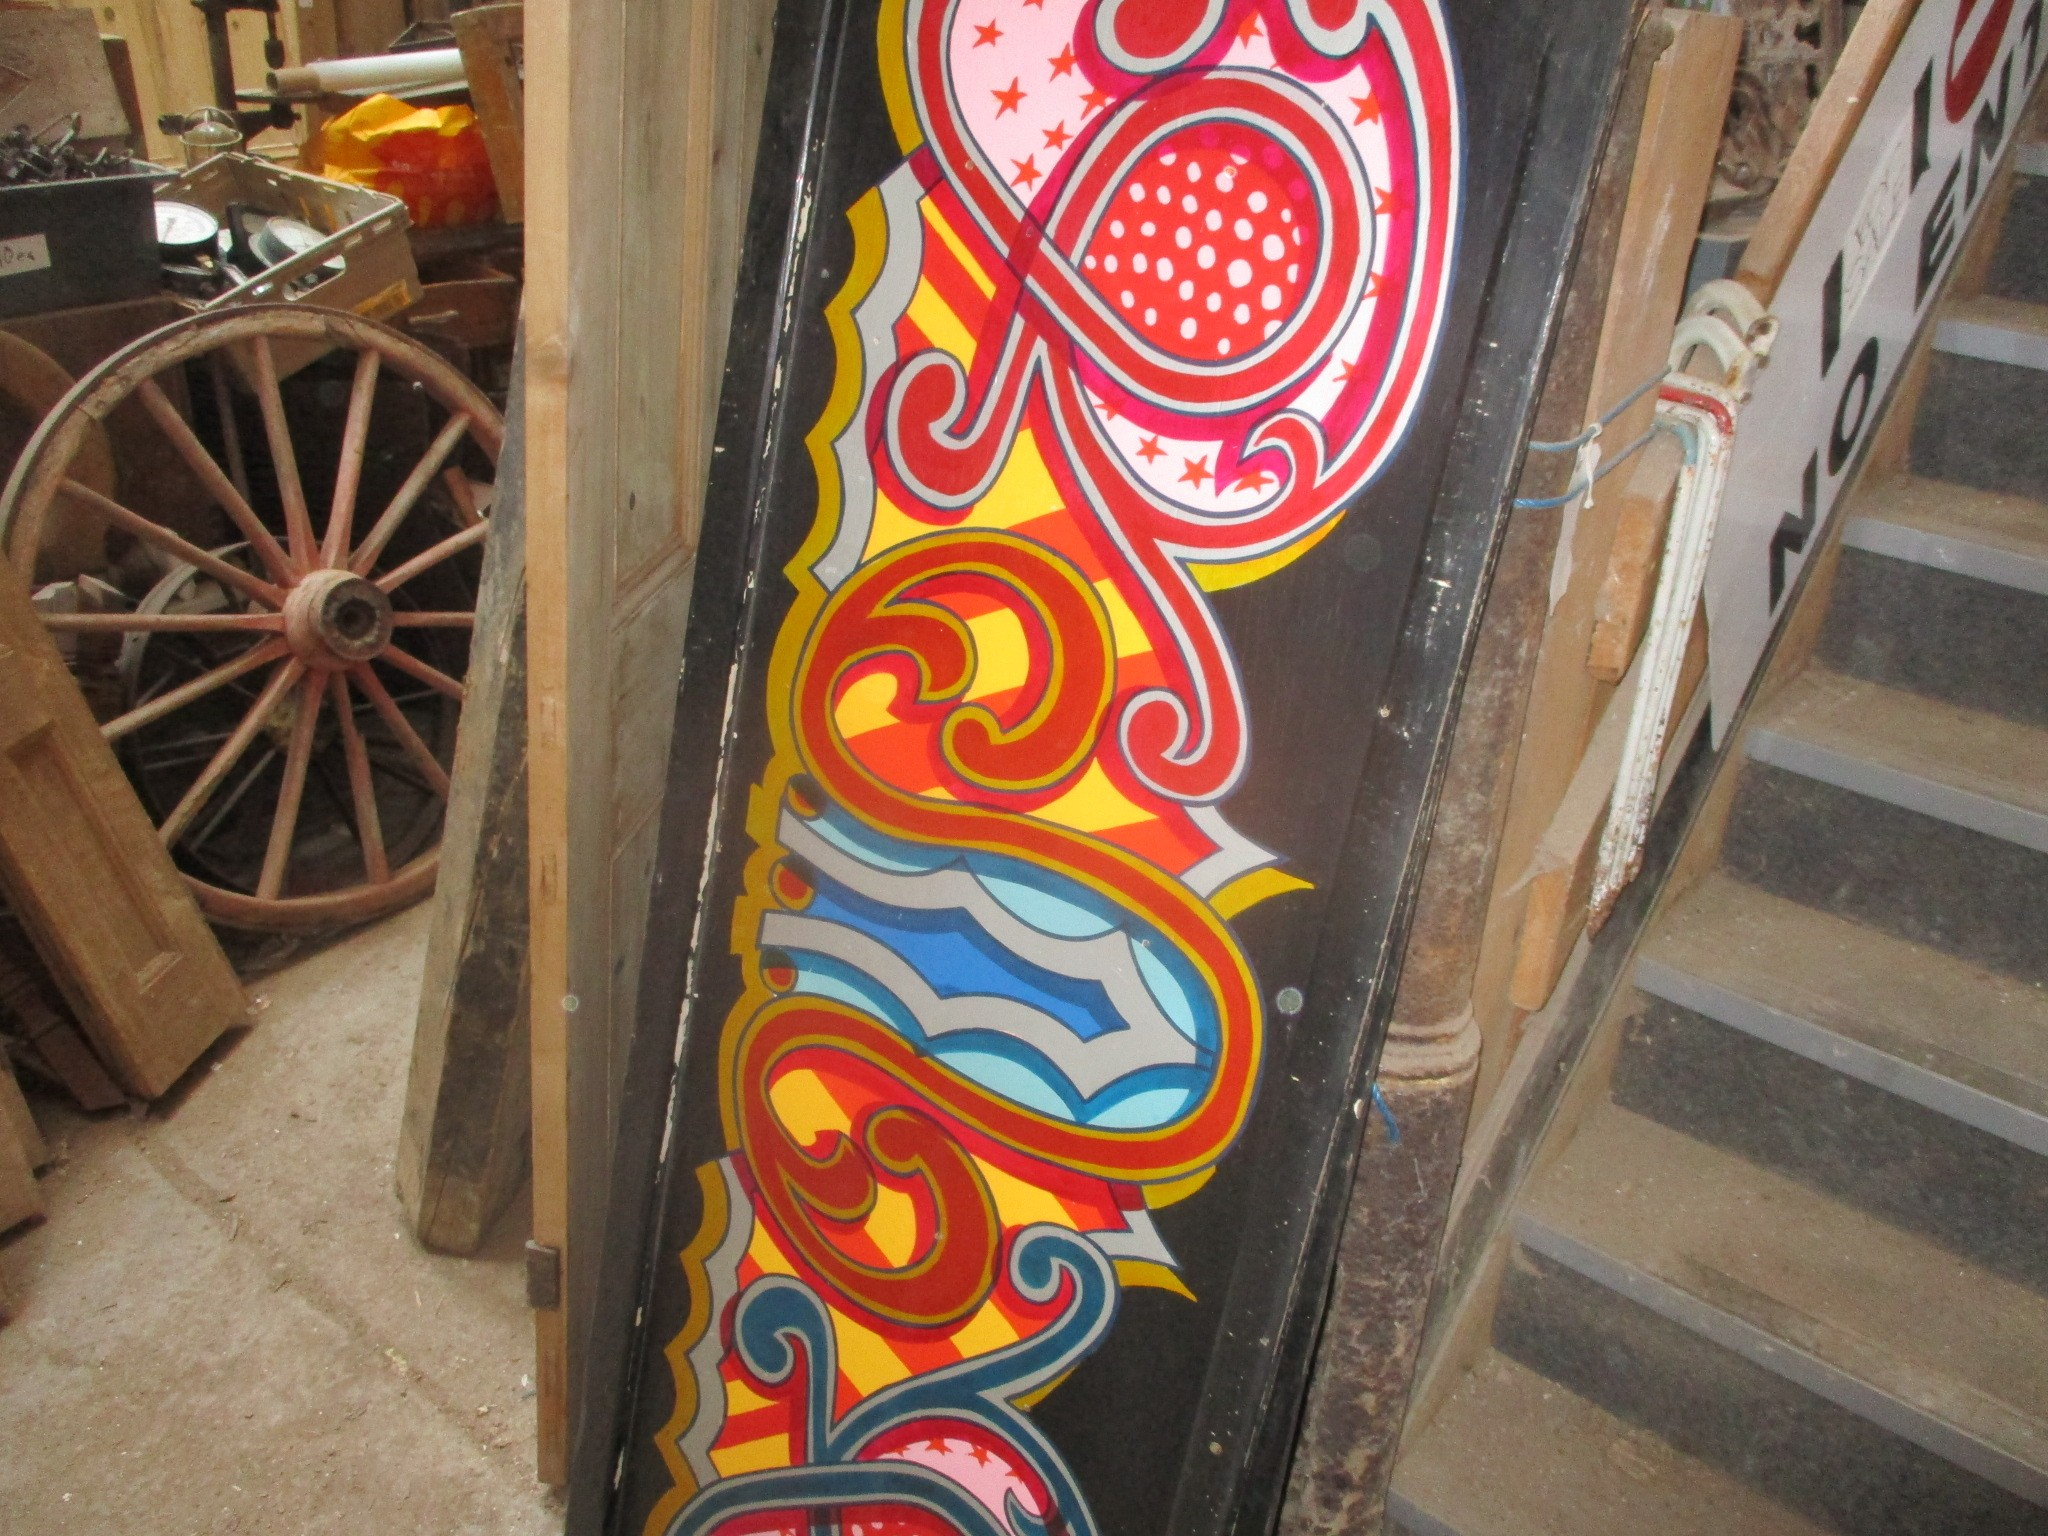 Fairground Decorative Hand- painted oil on Plywood signage